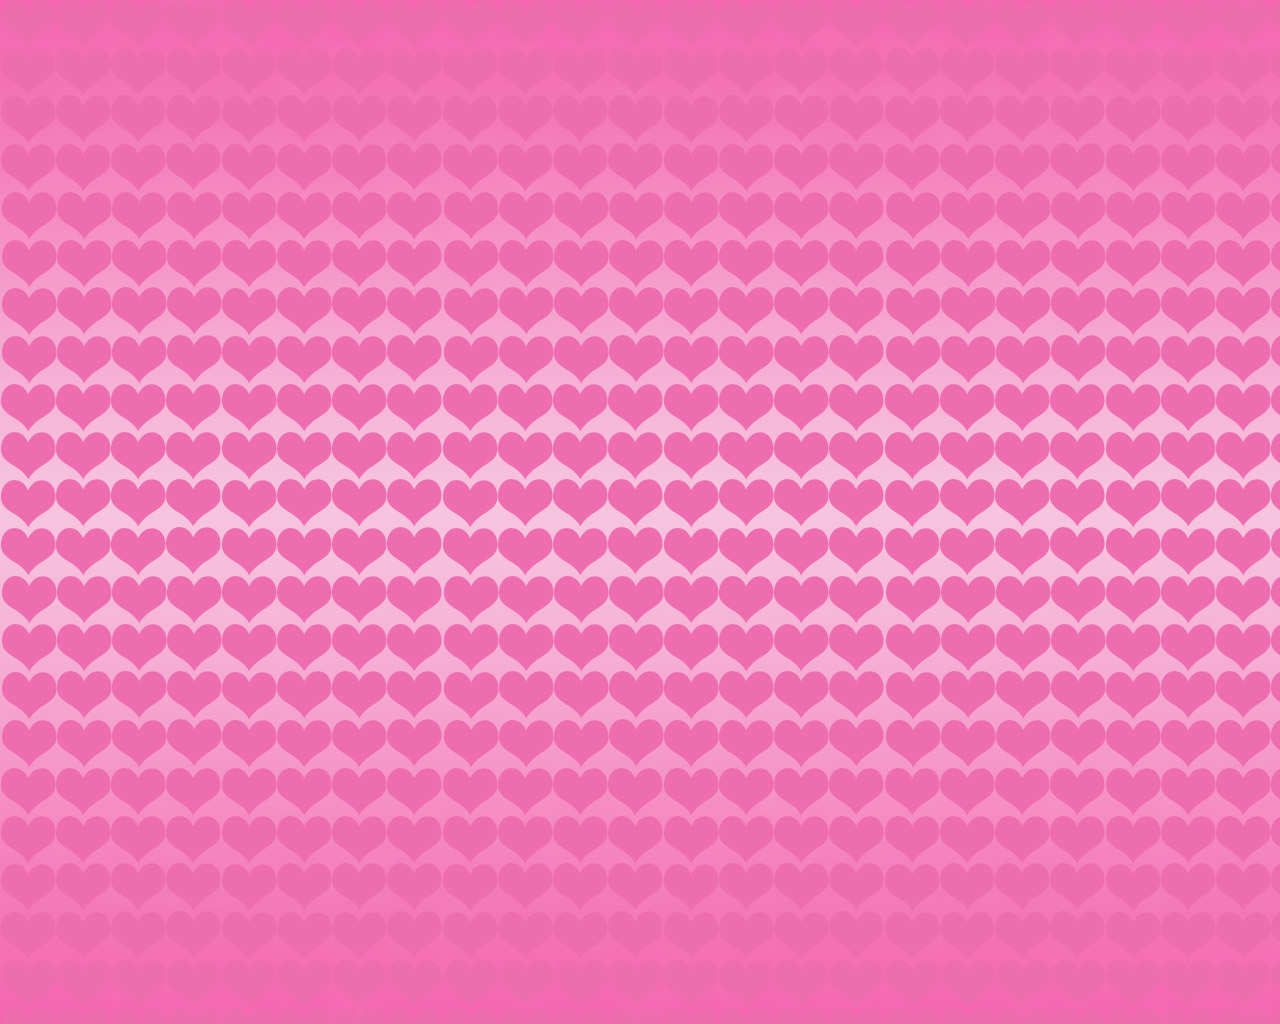 desktop wallpapers girly